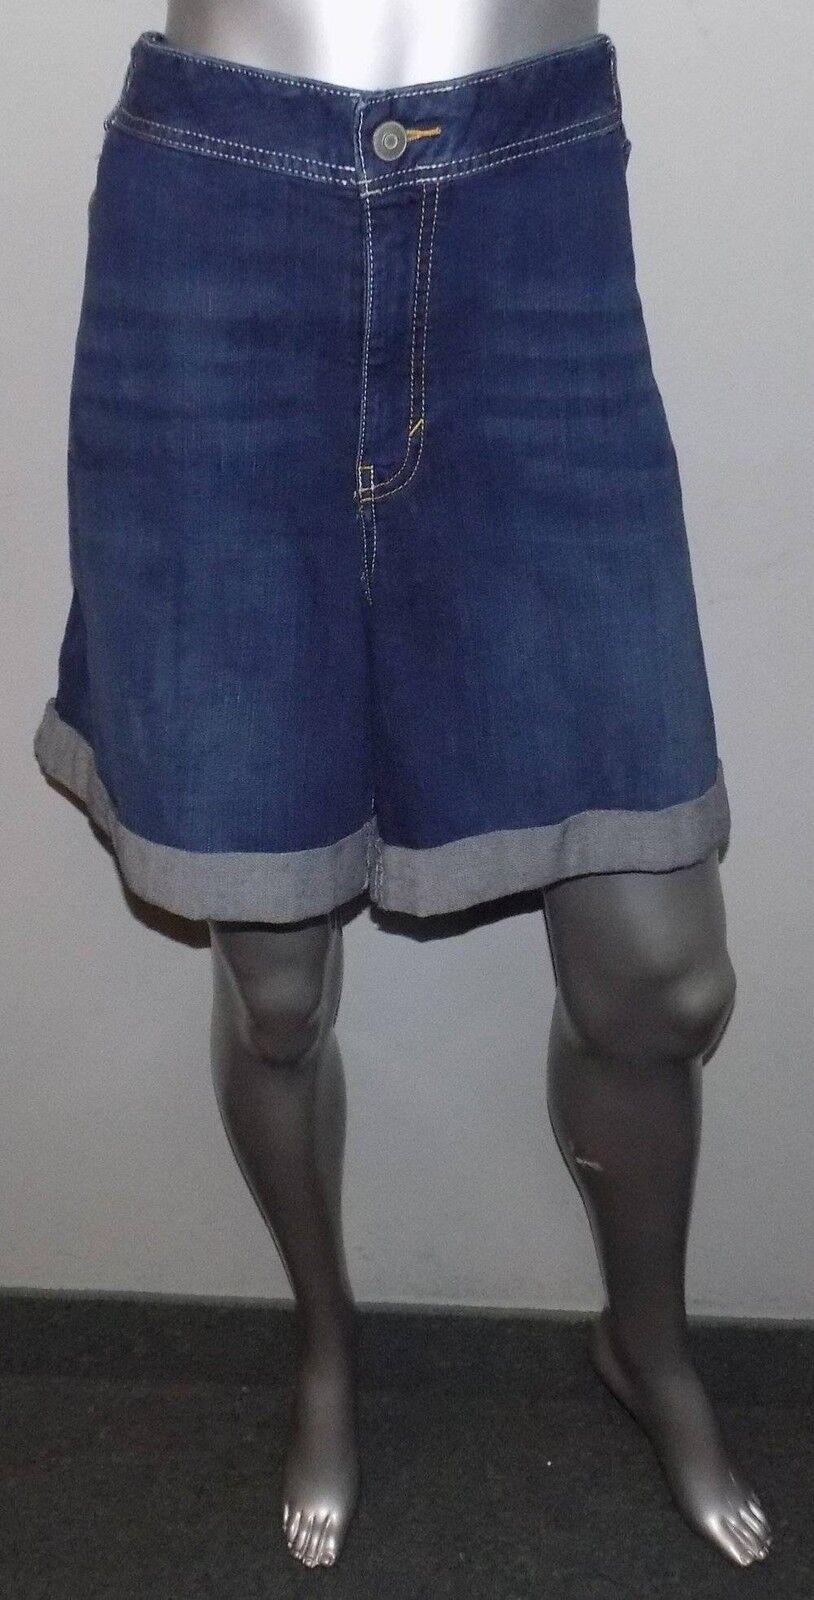 LANE BRYANT NWT Medium bluee Whisker Wash Cuffed Leg Jean Shorts Plus sz 26 26W